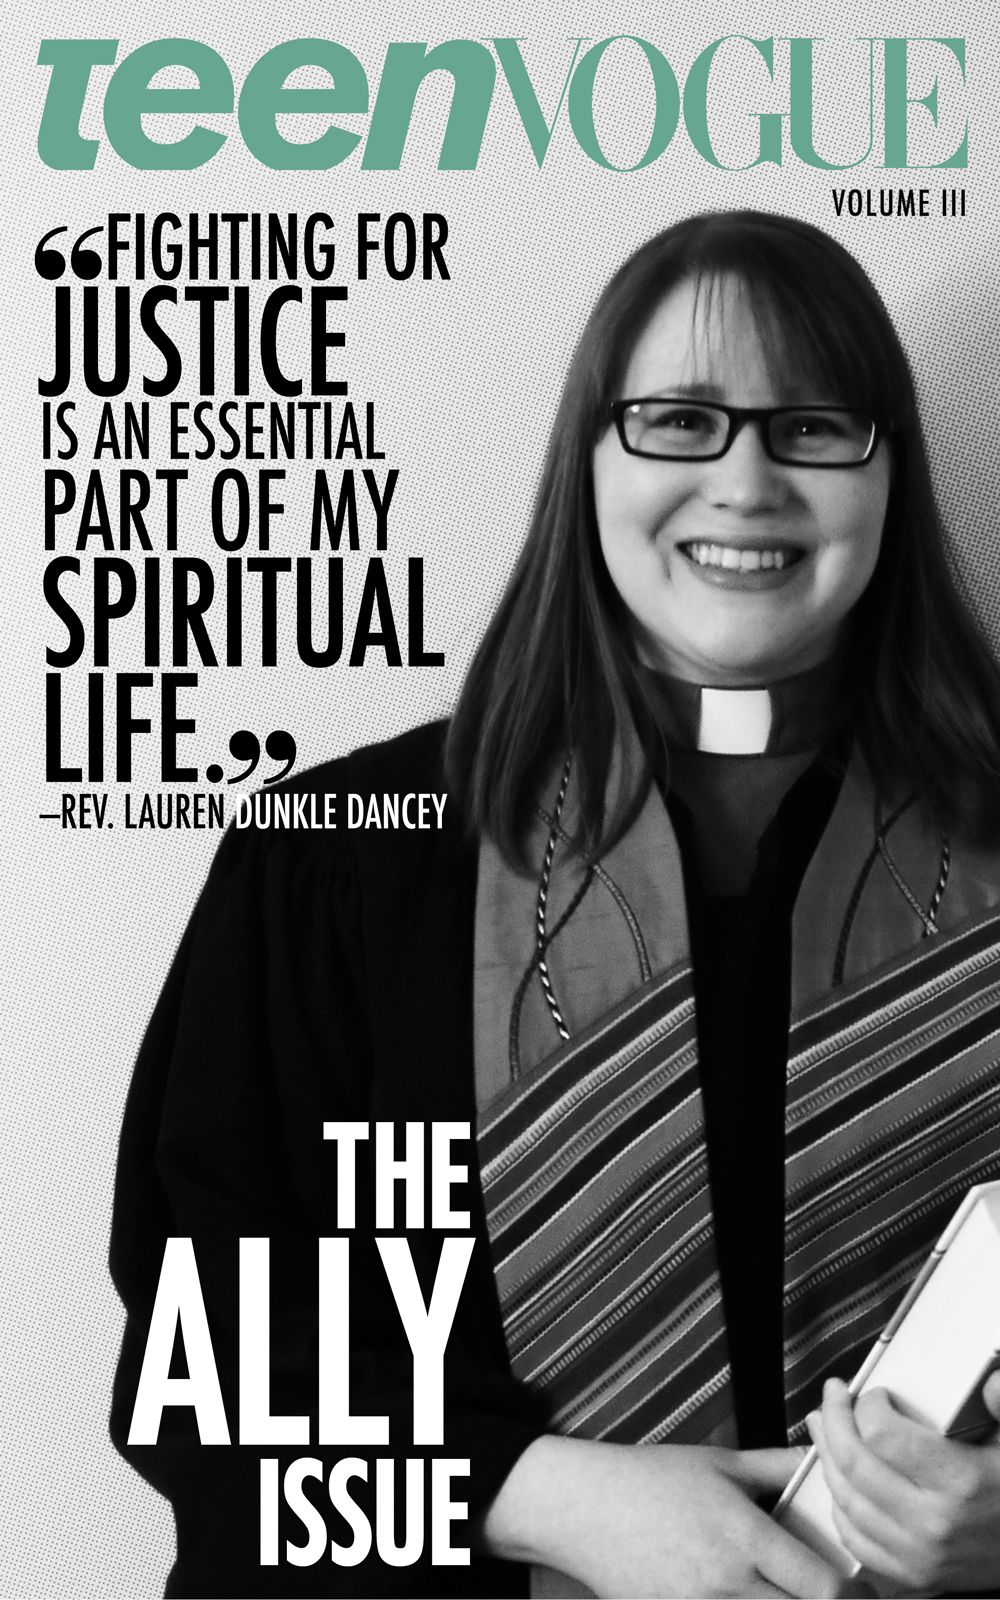 Rev. Lauren Dunkle Dancey Katherine Young